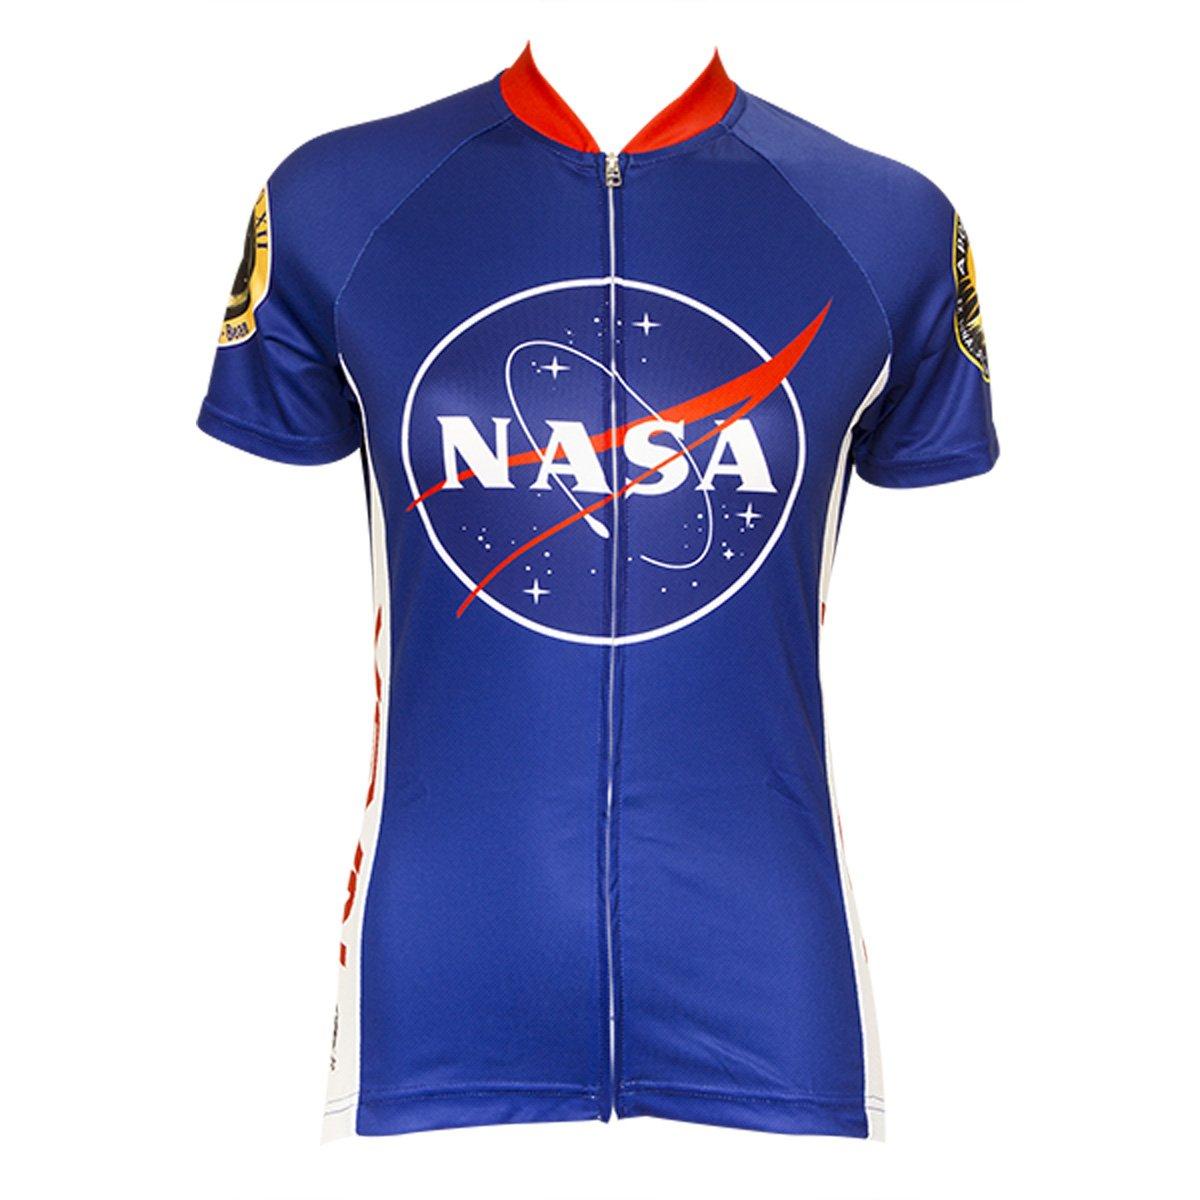 Retro Two Women's NASA Short-Sleeve Jersey